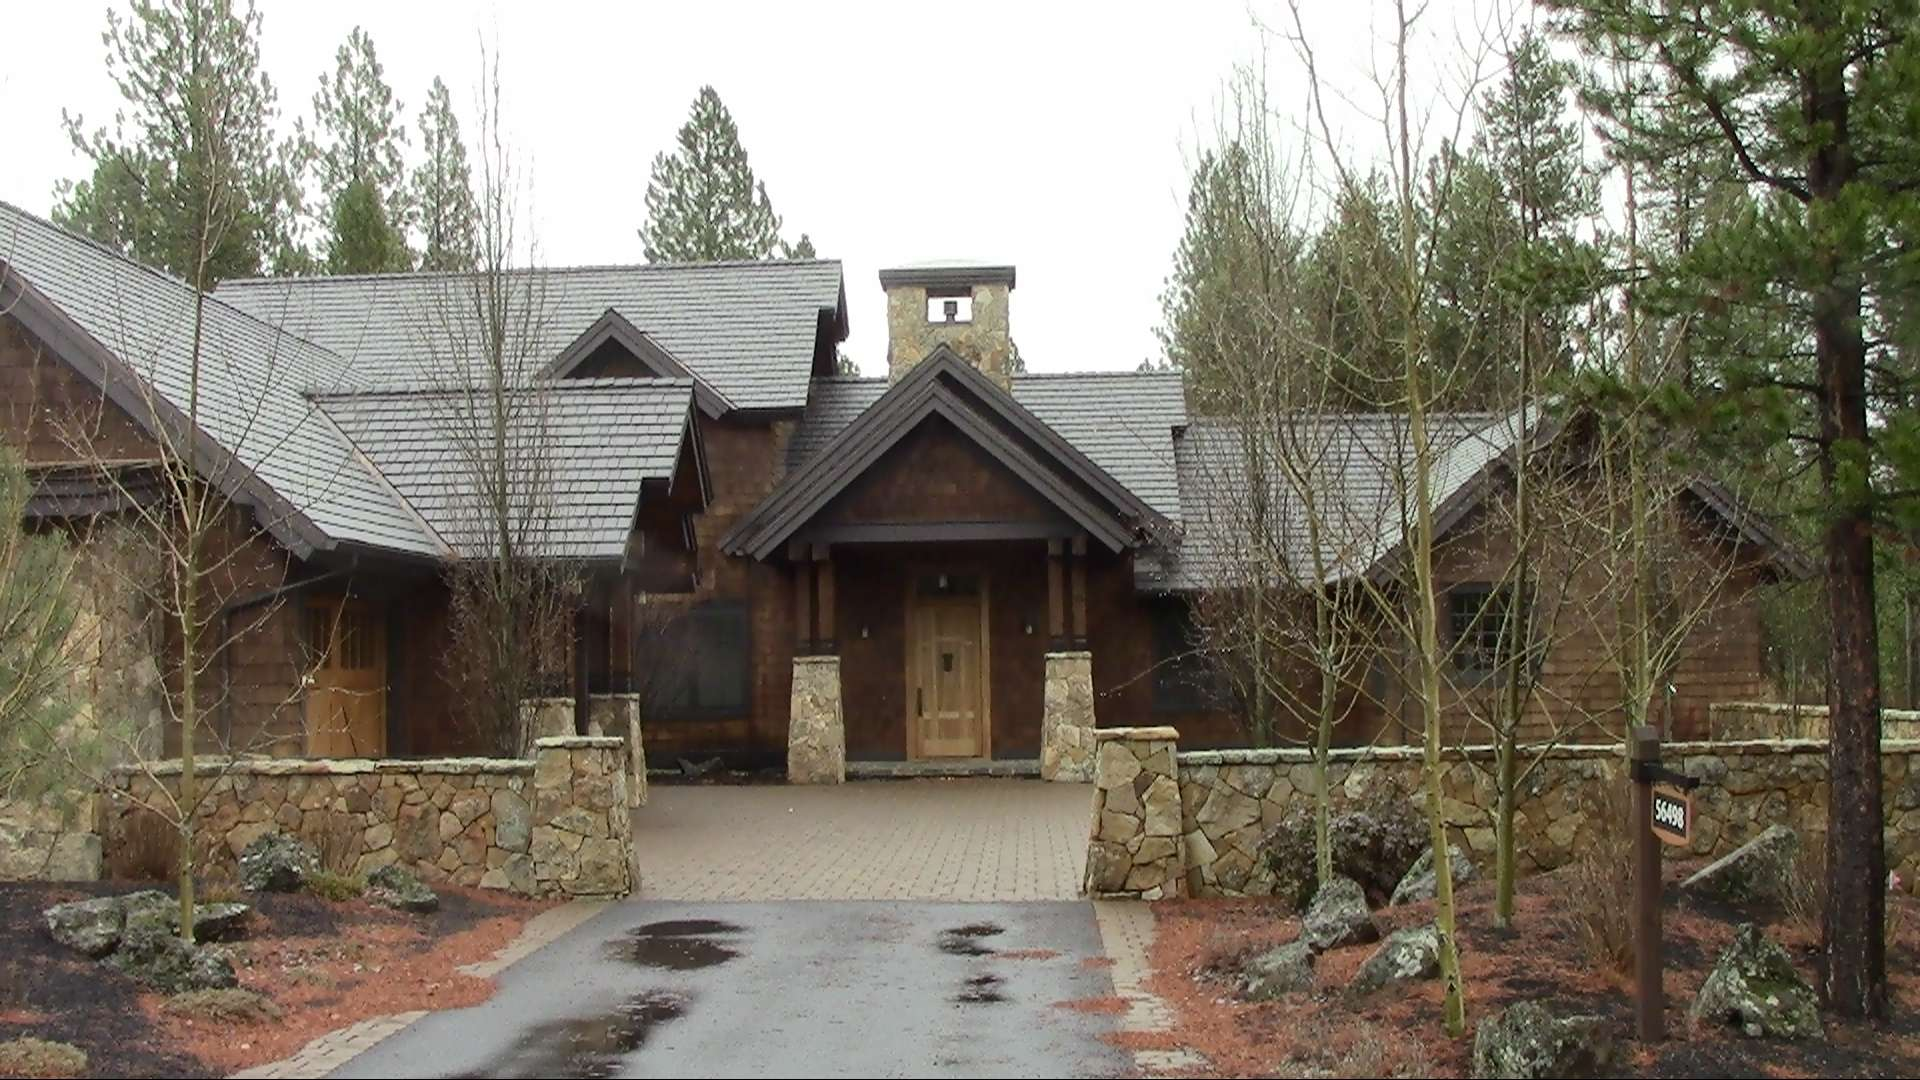 Ken Baune Homes and Remodel image 2